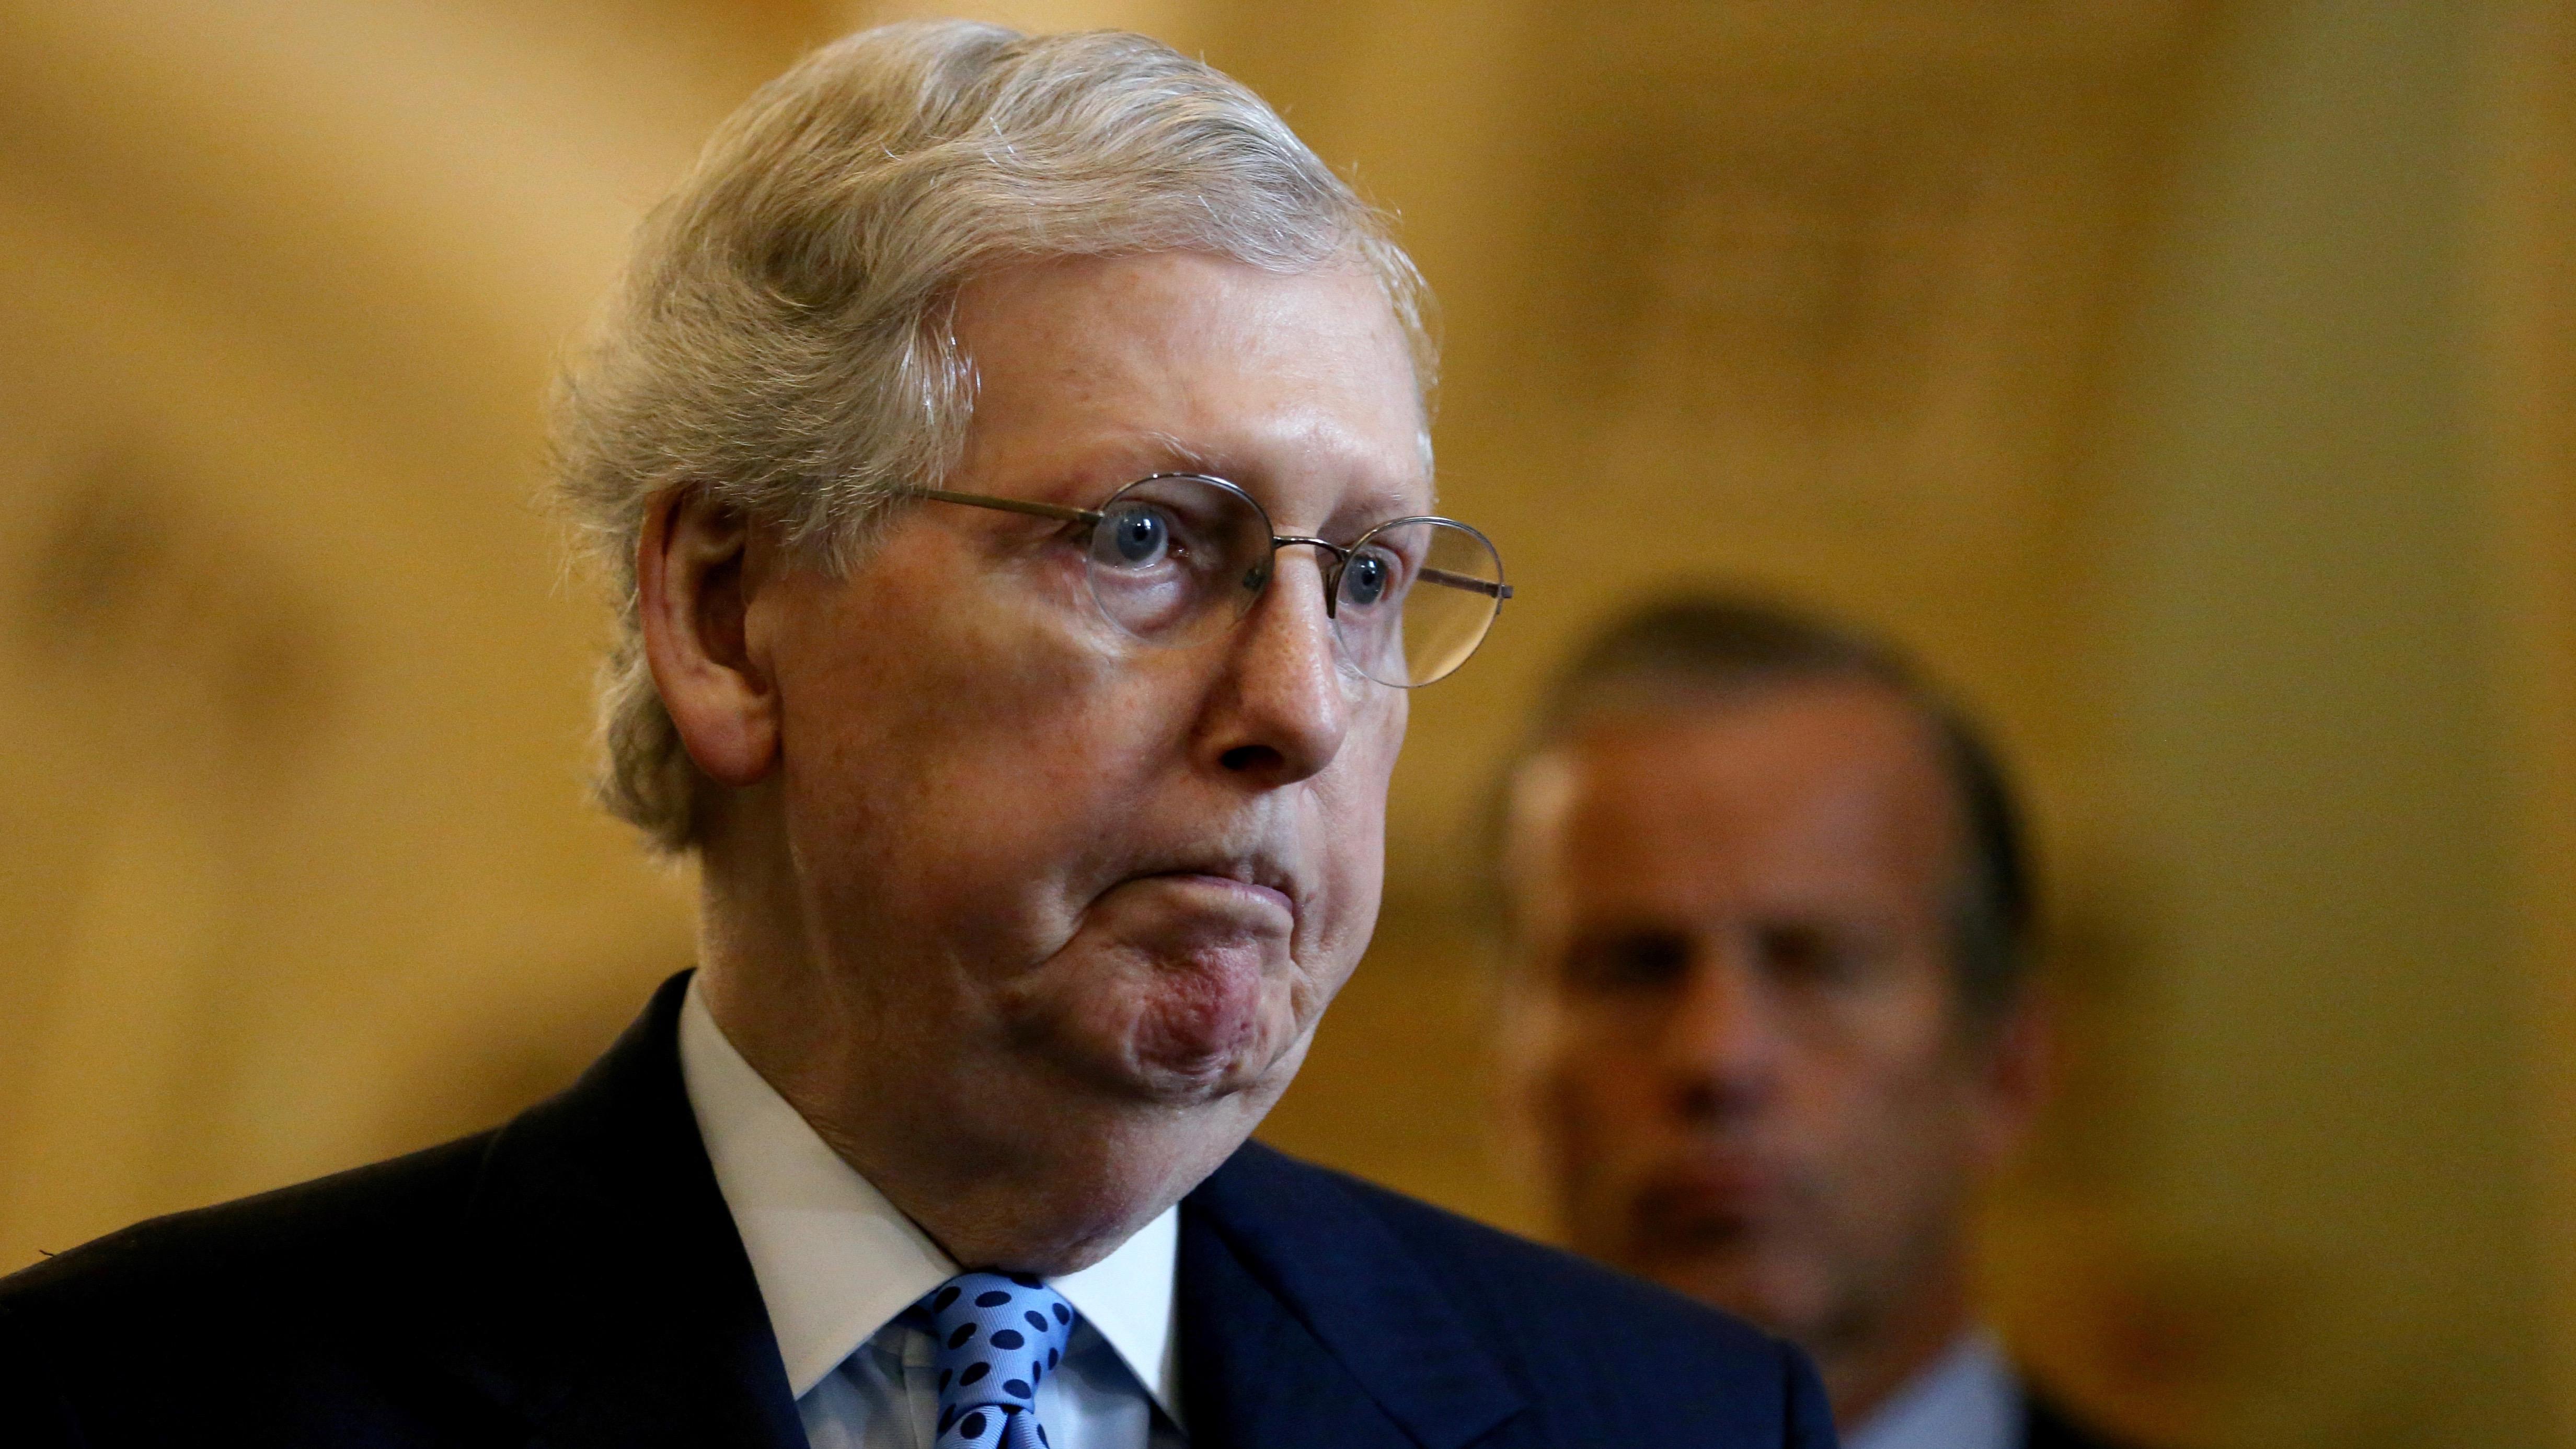 Republican senators just sent the US Supreme Court a strange letter